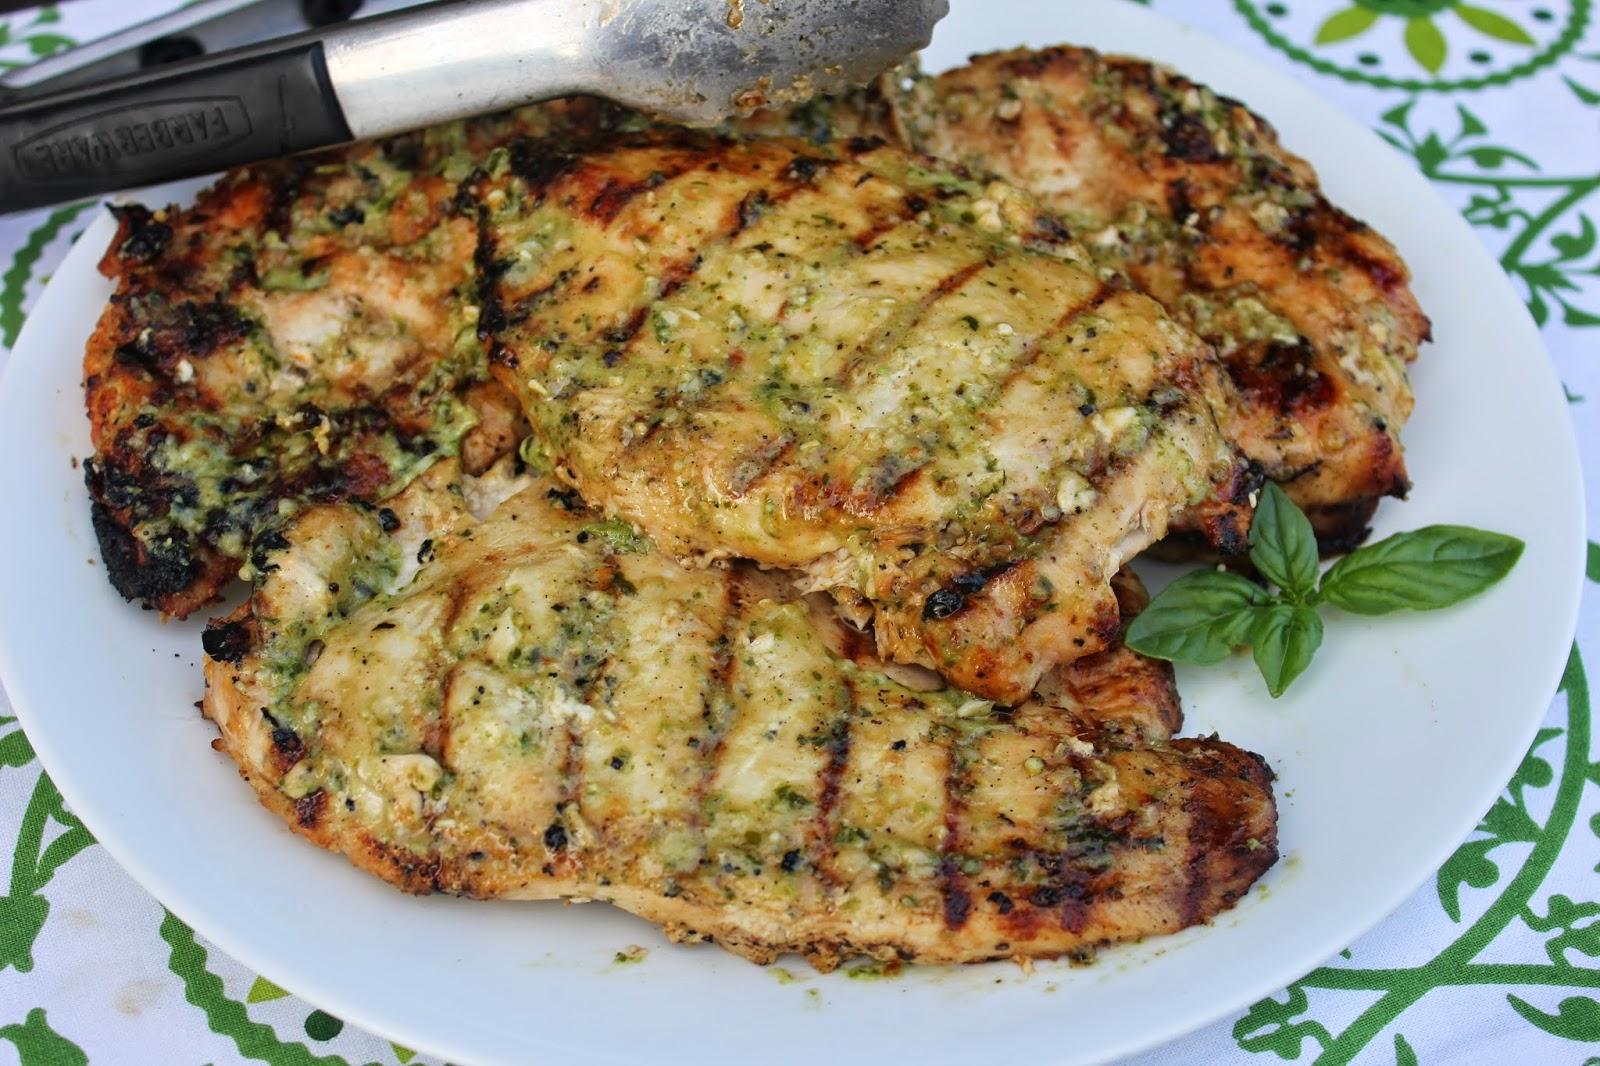 Recipe:  Chicken, Recipe:  Main Dish, easy marinade, grilling, barbecue marinade ideas, Summer Dishes, Summer Favorites, Easy Meal Ideas, Lemon Pesto Chicken Marinade